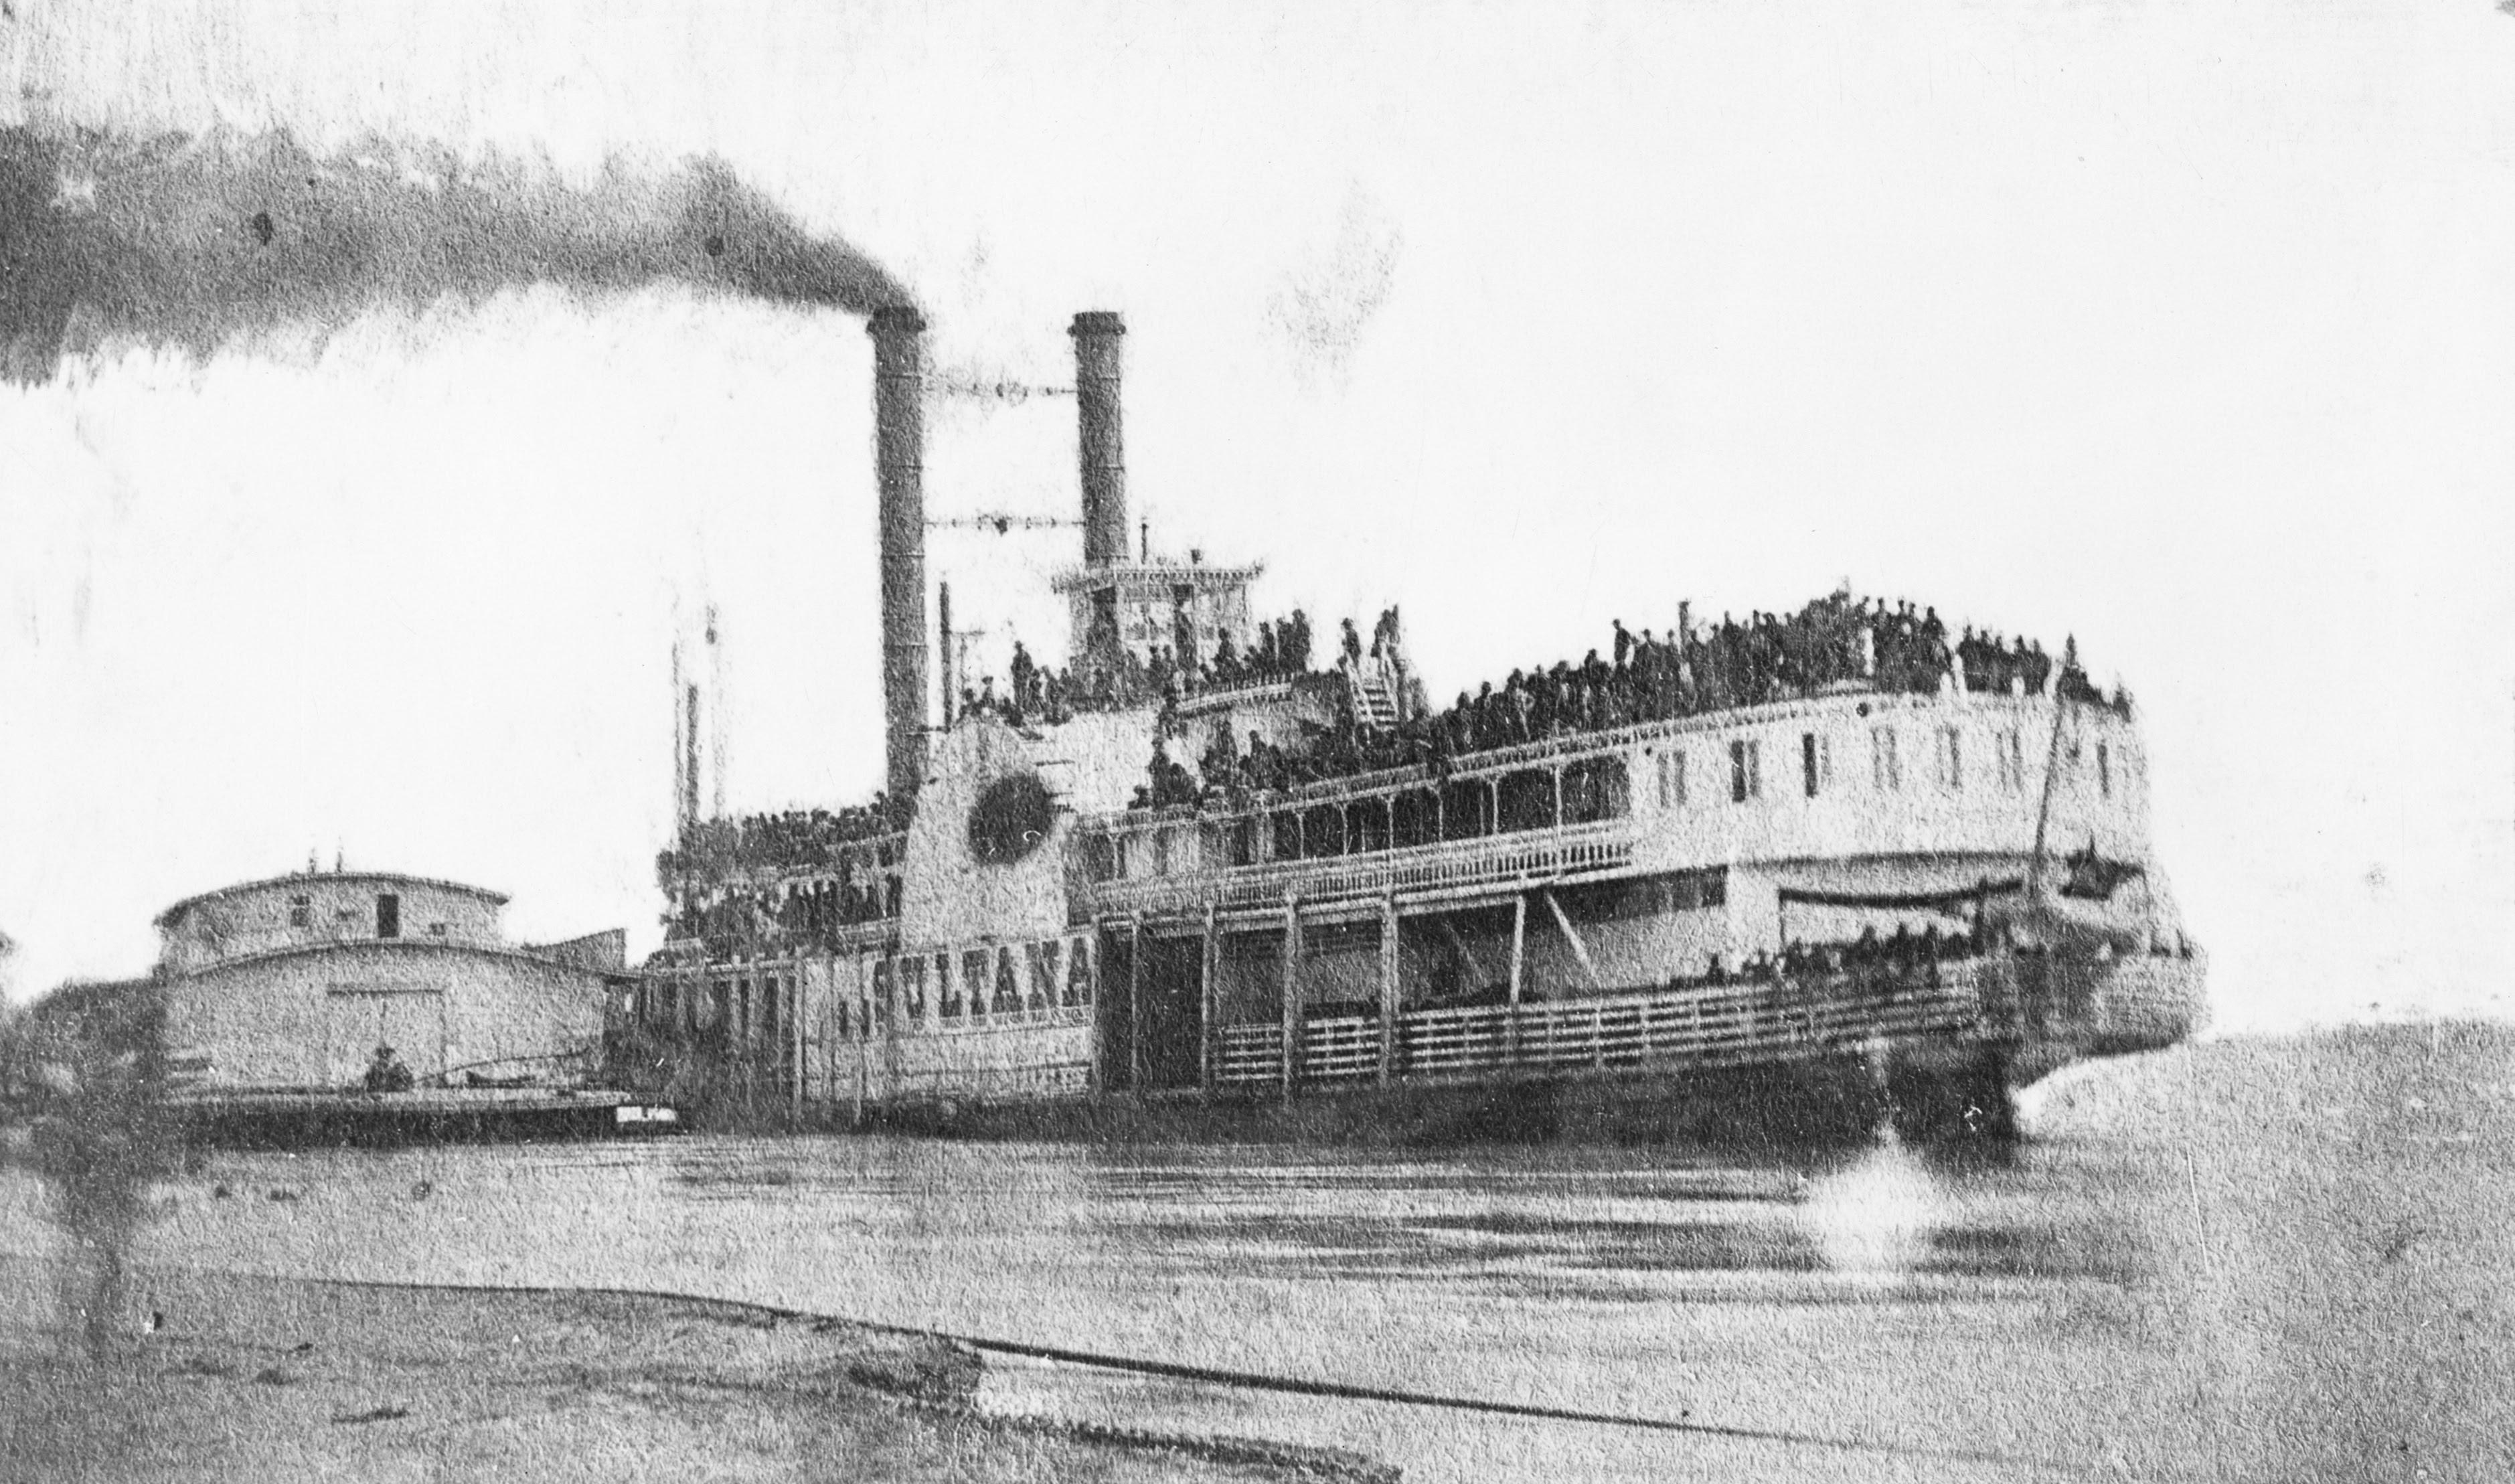 http://upload.wikimedia.org/wikipedia/commons/6/69/Ill-fated_Sultana,_Helena,_Arkansas,_April_27,_1865.jpg